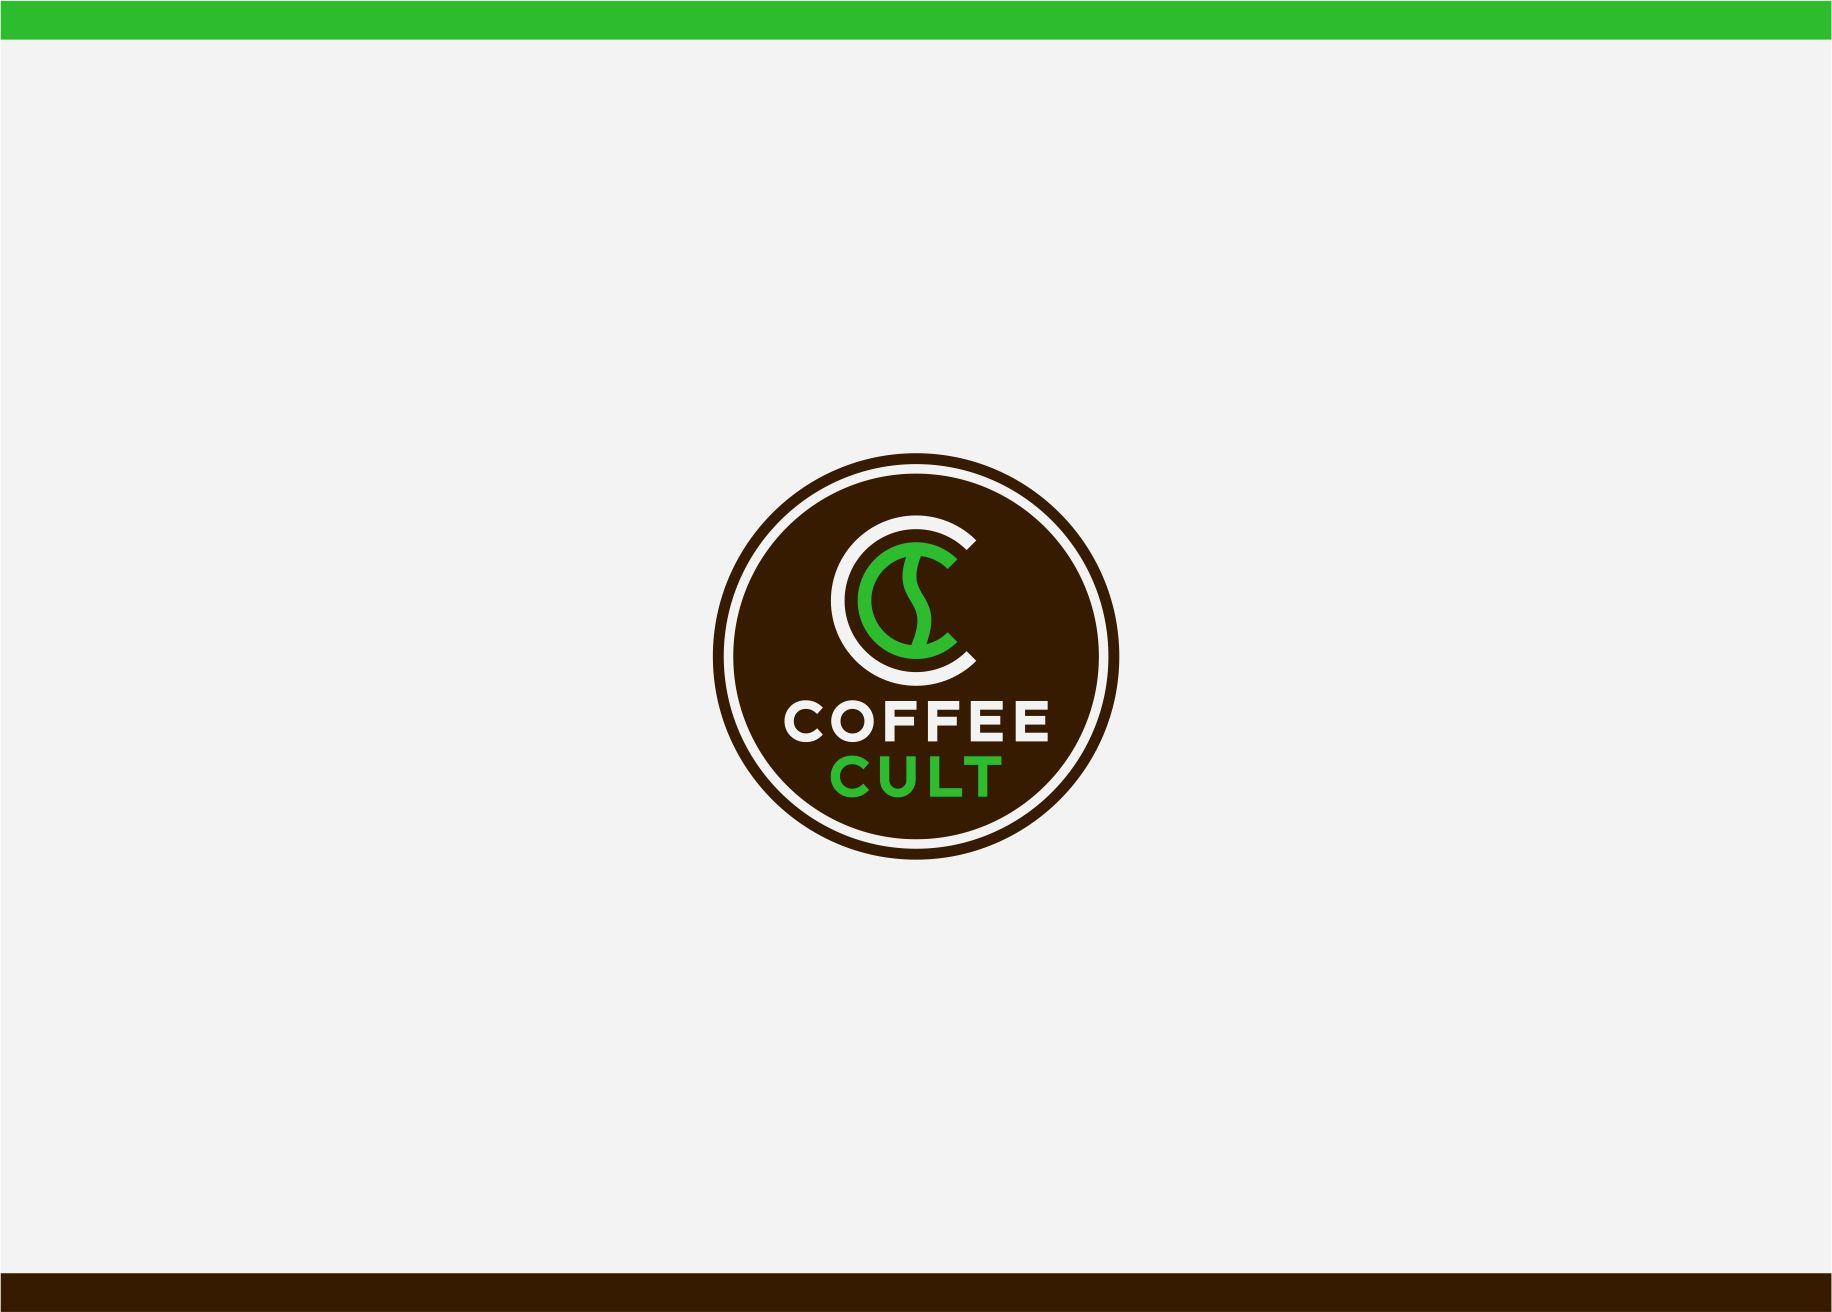 Логотип и фирменный стиль для компании COFFEE CULT фото f_6005bc4aa52d4d3e.jpg